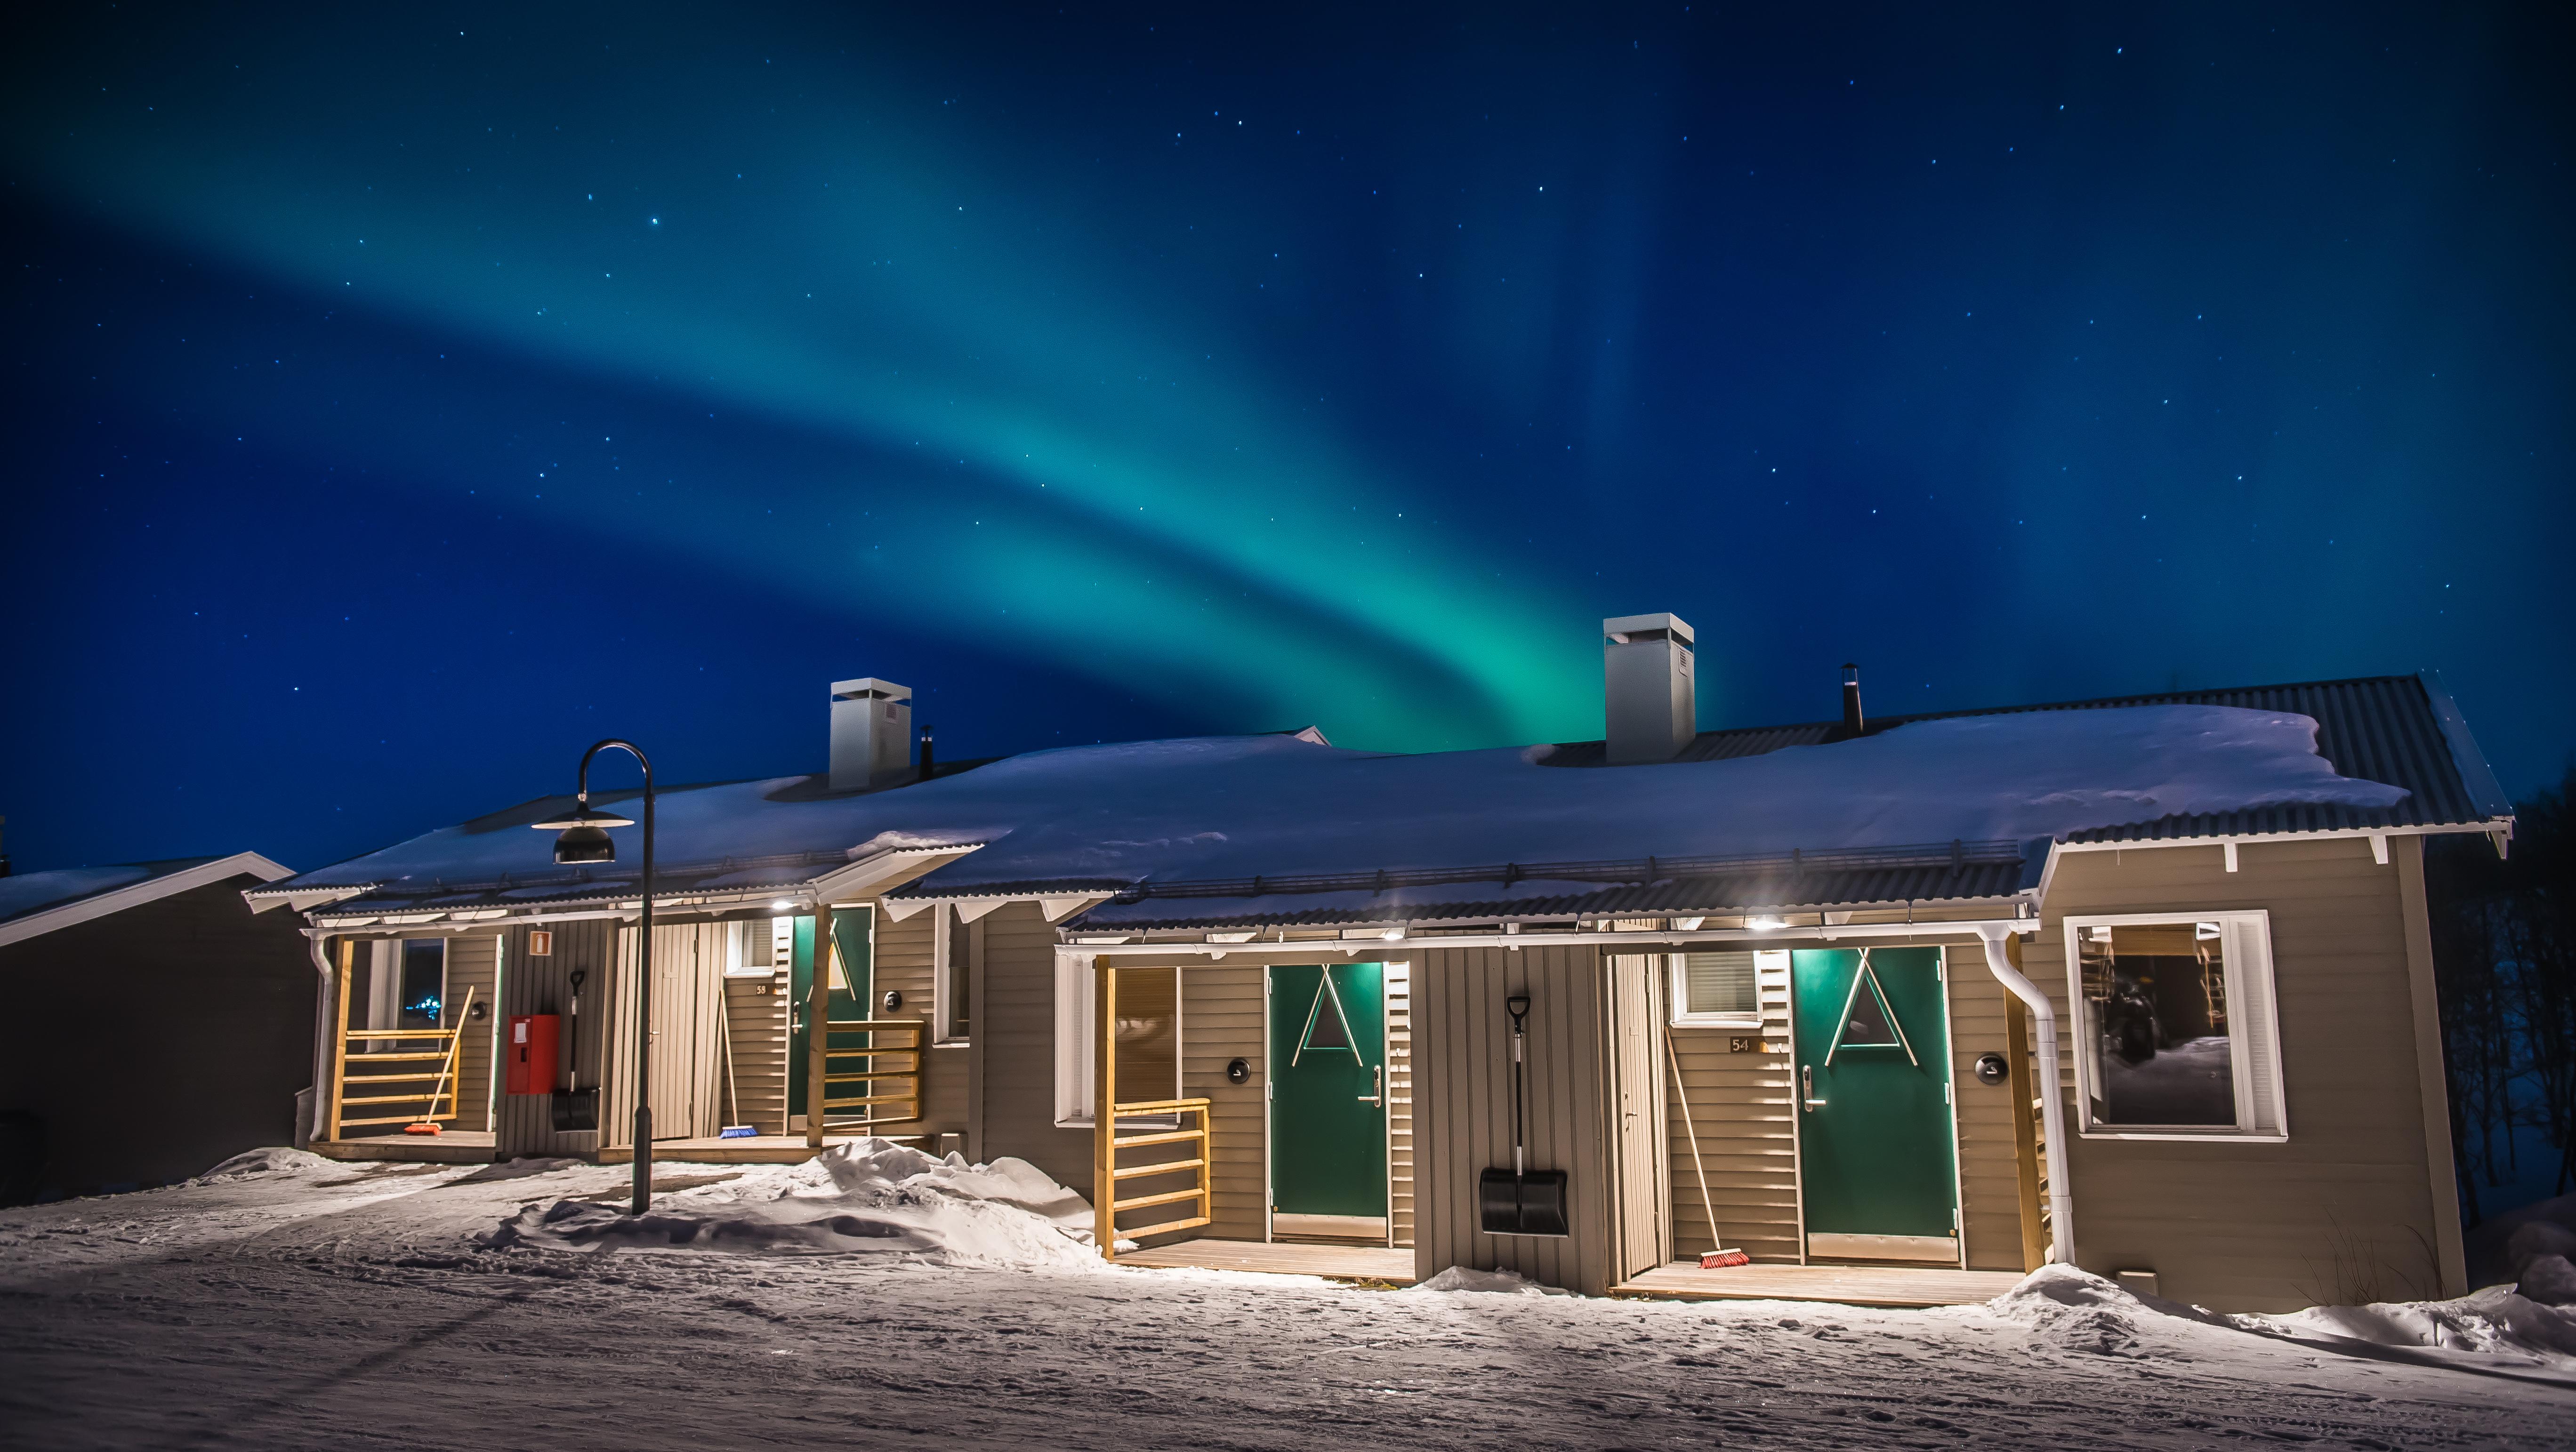 Northern lights in Kiruna | Camp Ripan